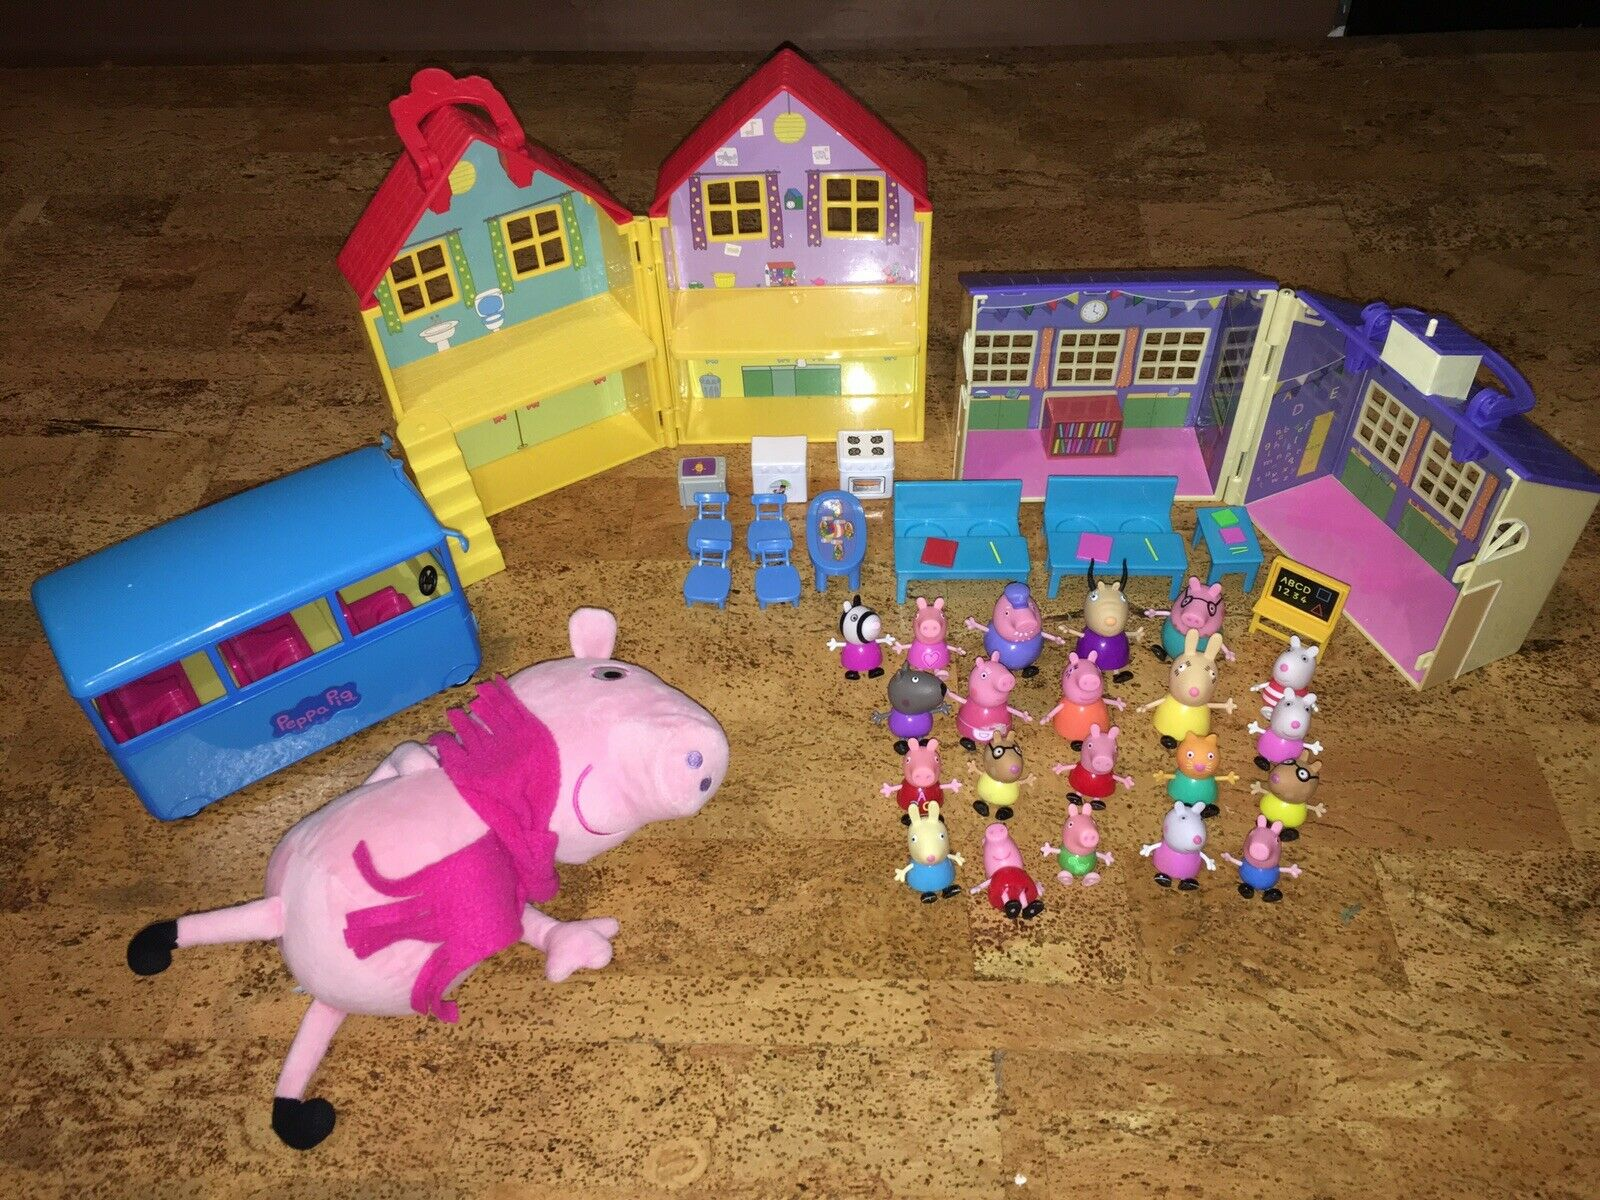 Huge Peppa Pig toy Lot Bus School House Stuffed Peppa